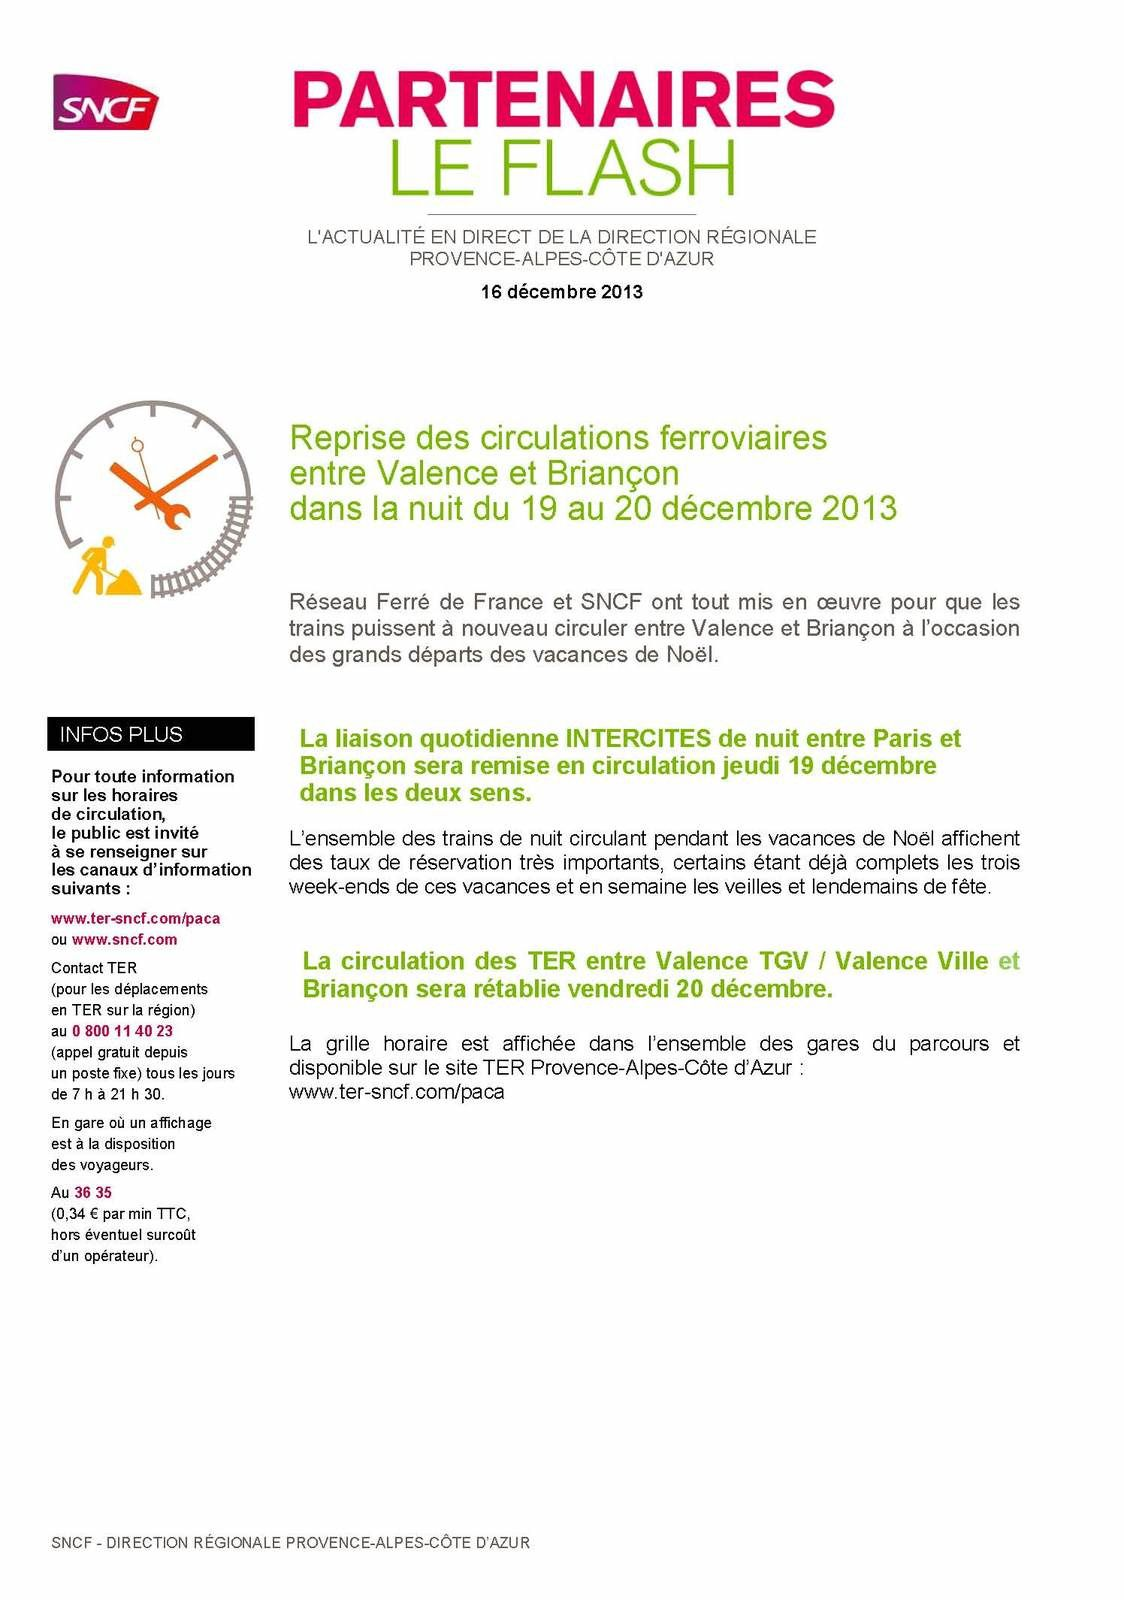 Circulation bientôt rétablie entre Valence - Veynes - Briançon